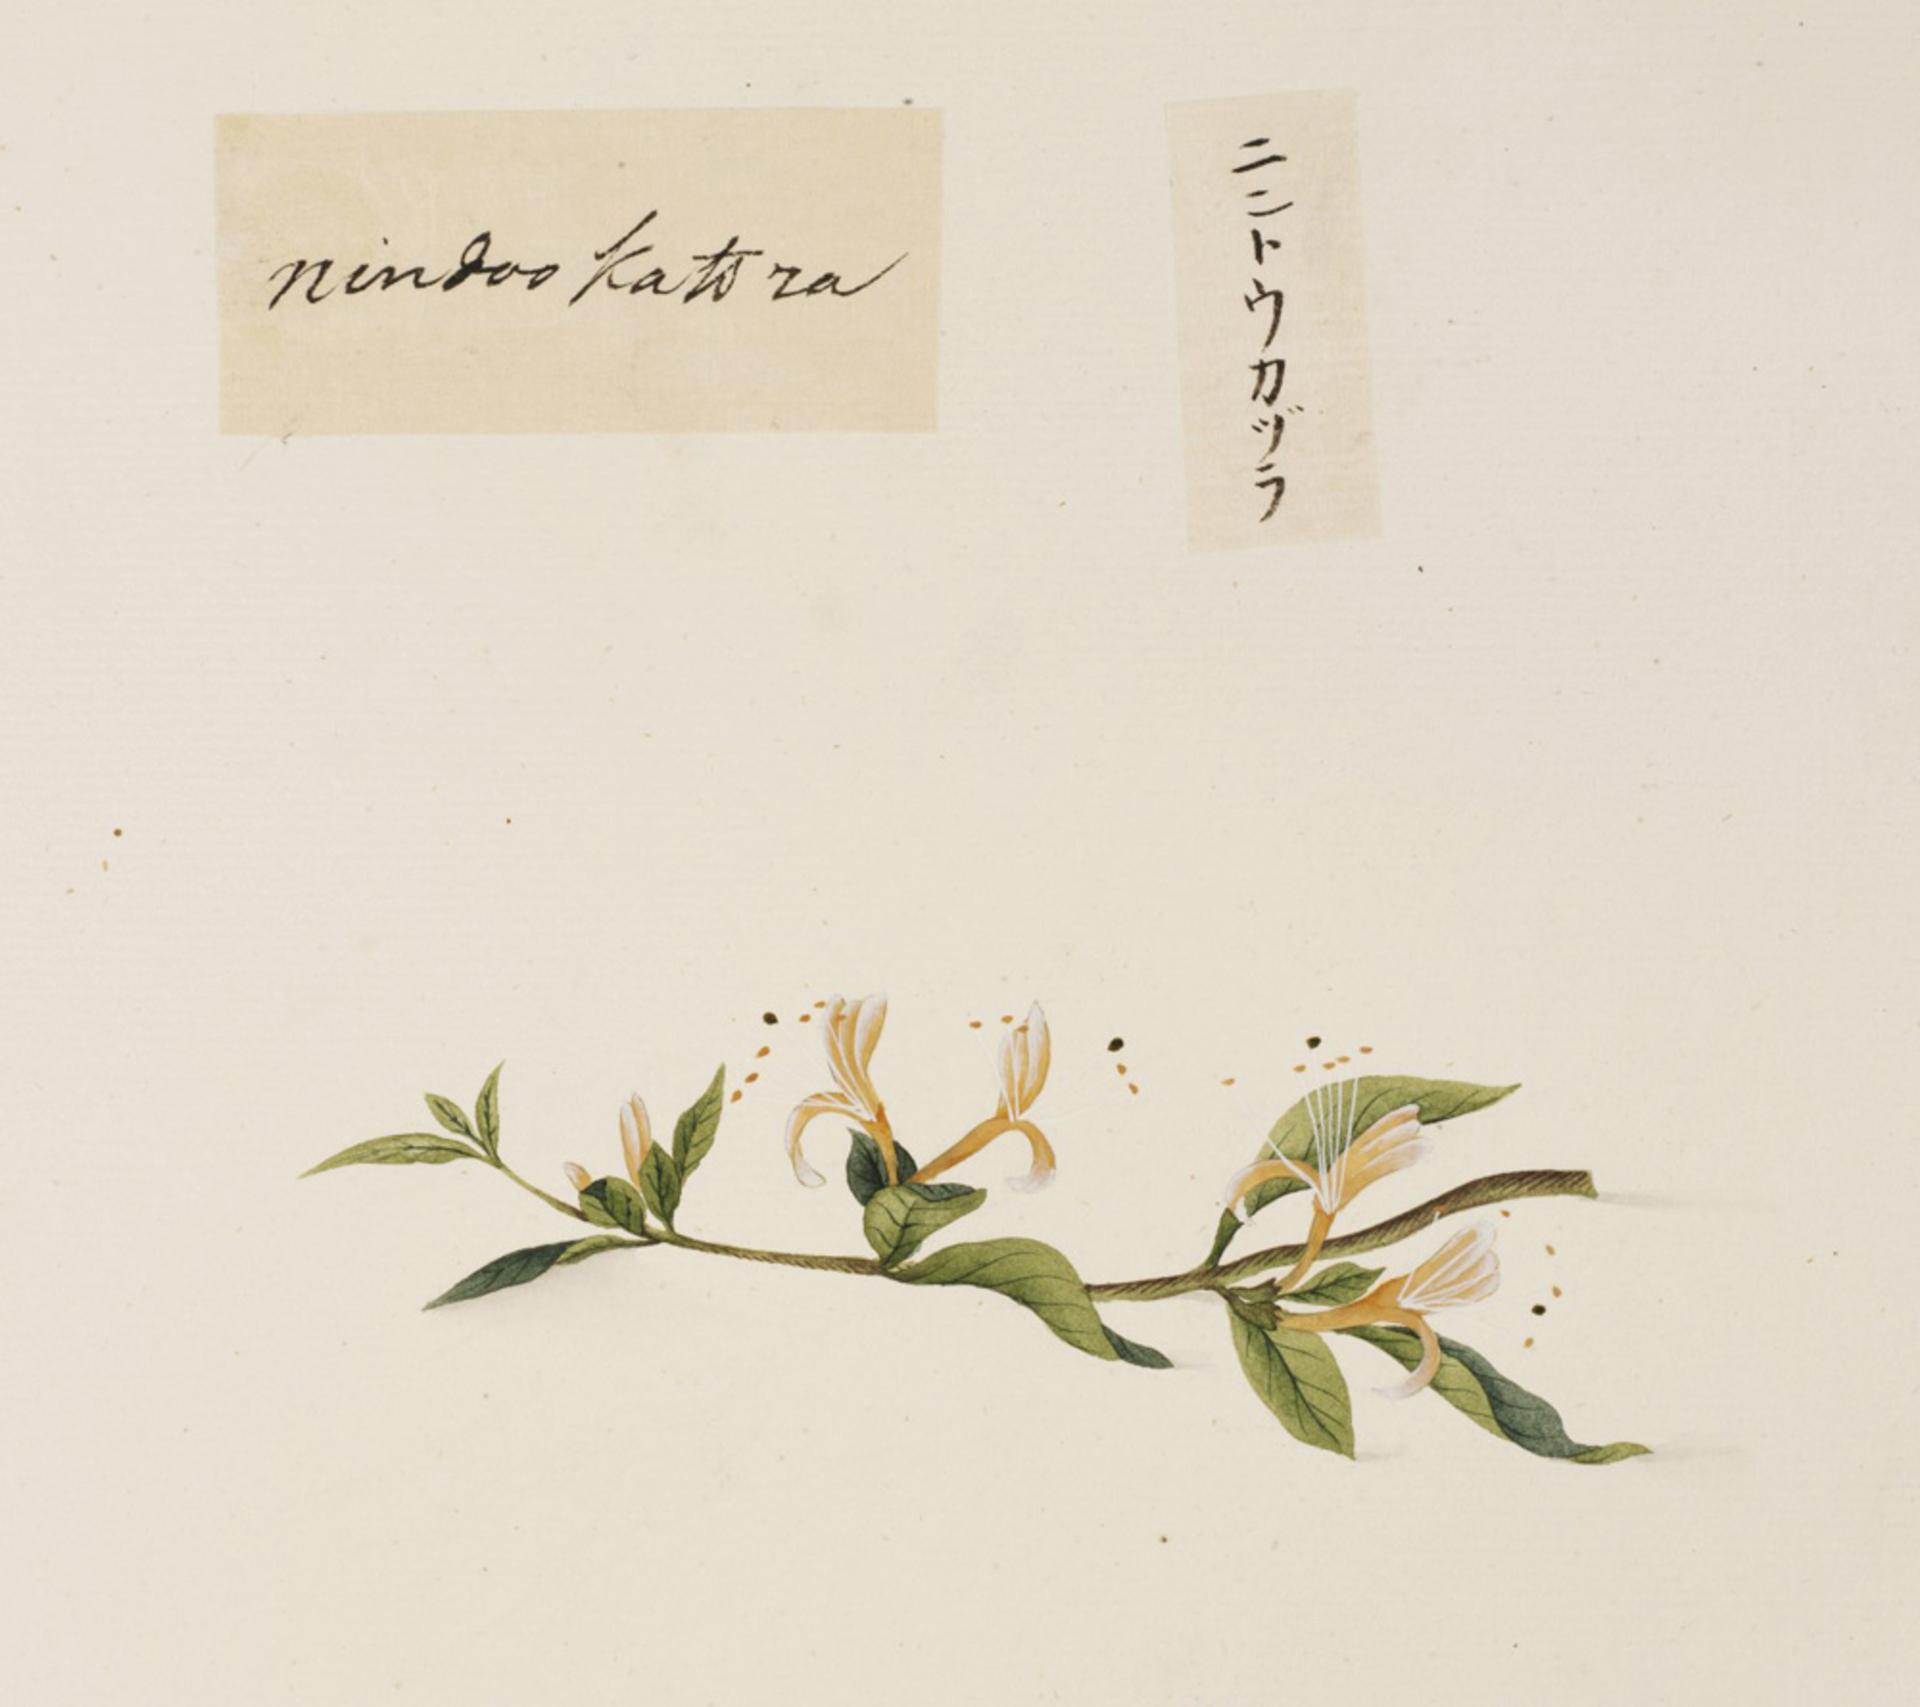 RMNH.ART.664 | Lonicera japonica